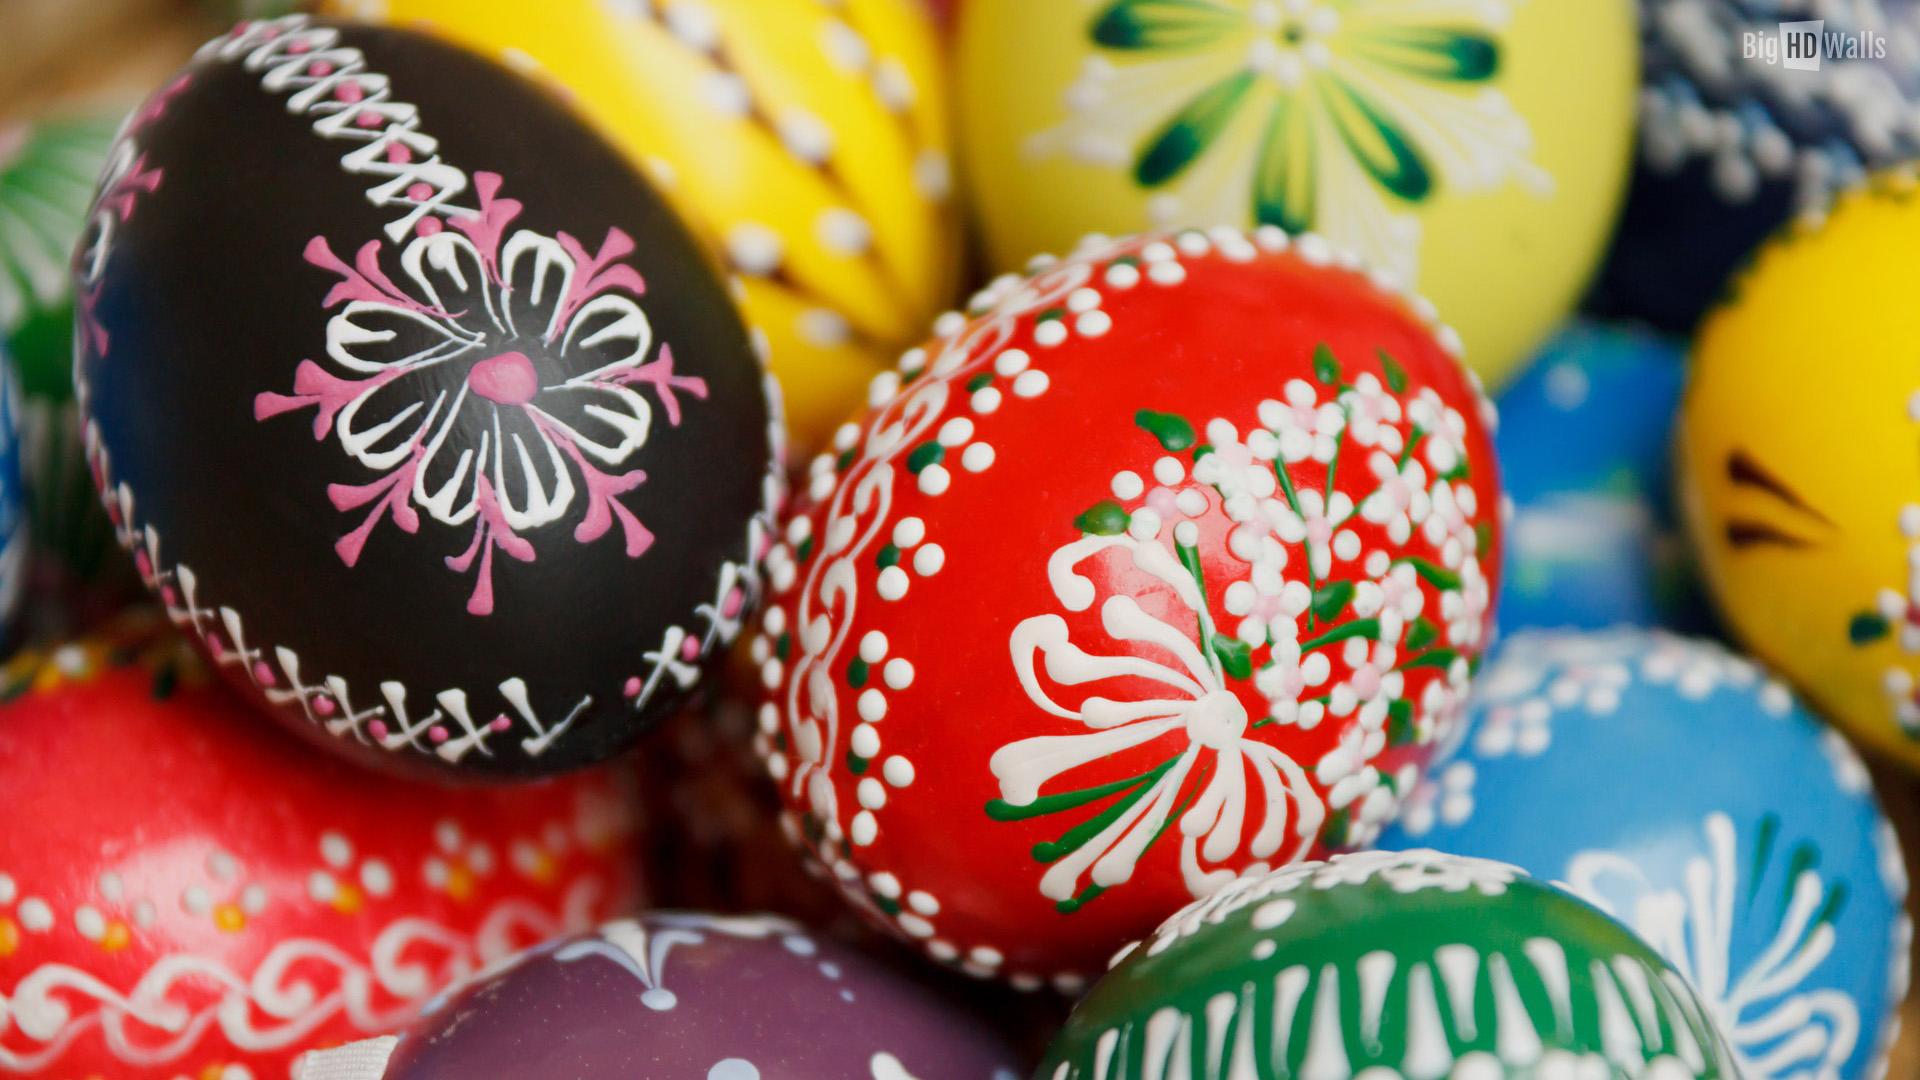 Easter eggs wallpaper hd jpg 297404 1920x1080